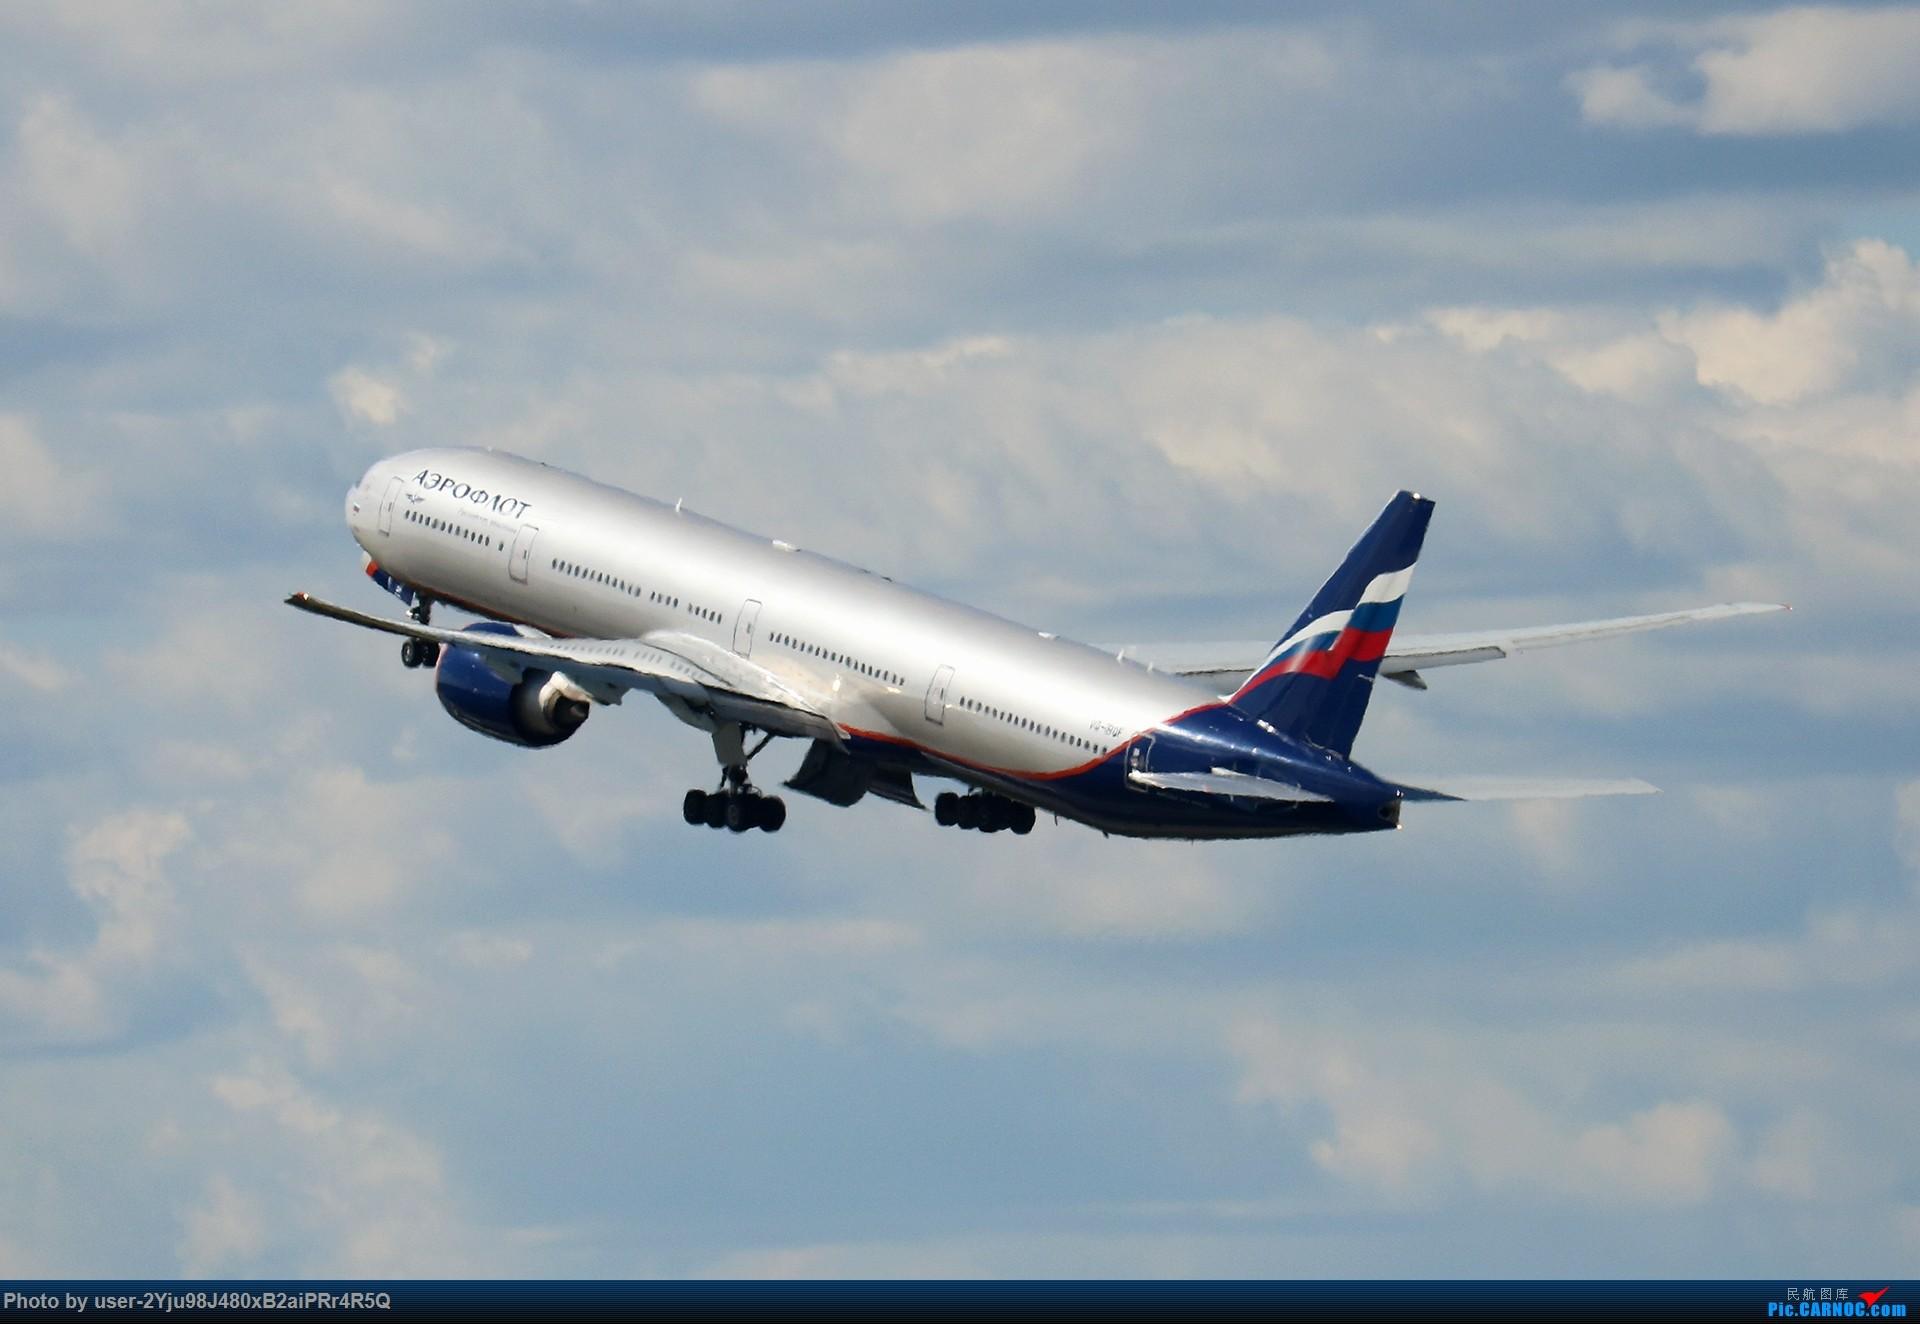 Re:[原创]LIULIU|Sheremetyevo的漫游|其他篇 BOING 777-300ER VQ-BQF 俄罗斯谢诺梅杰沃机场